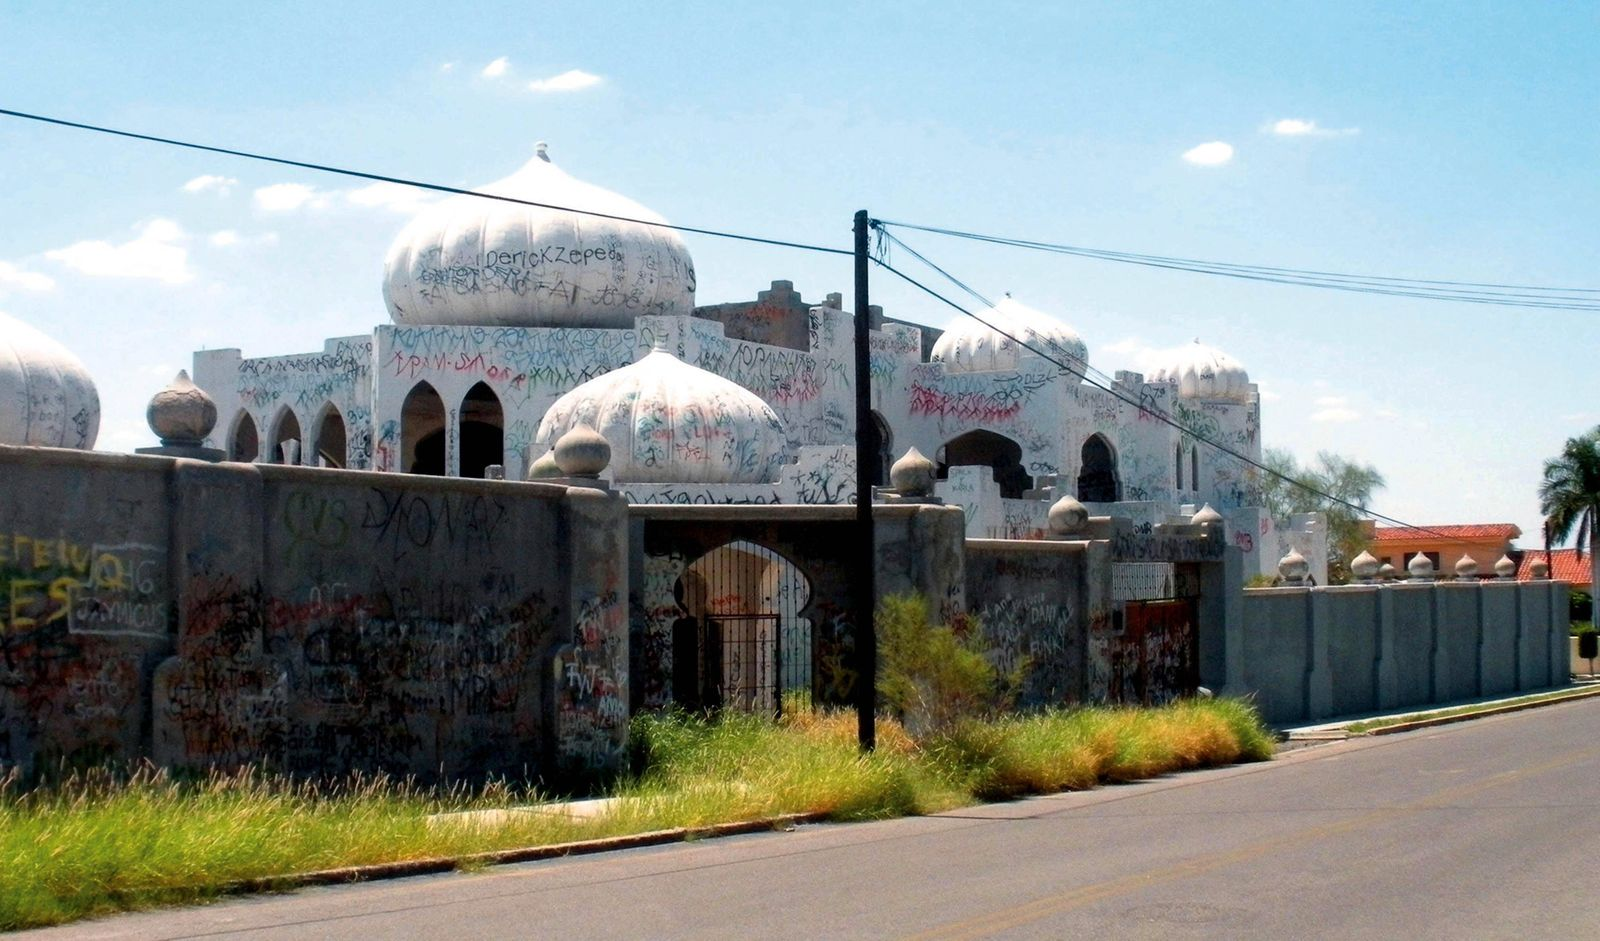 Sept 11 2011 Mexico G11091144 JPG Hermosillo Son Houses Drug trafficking Casas Narcotr¡fico